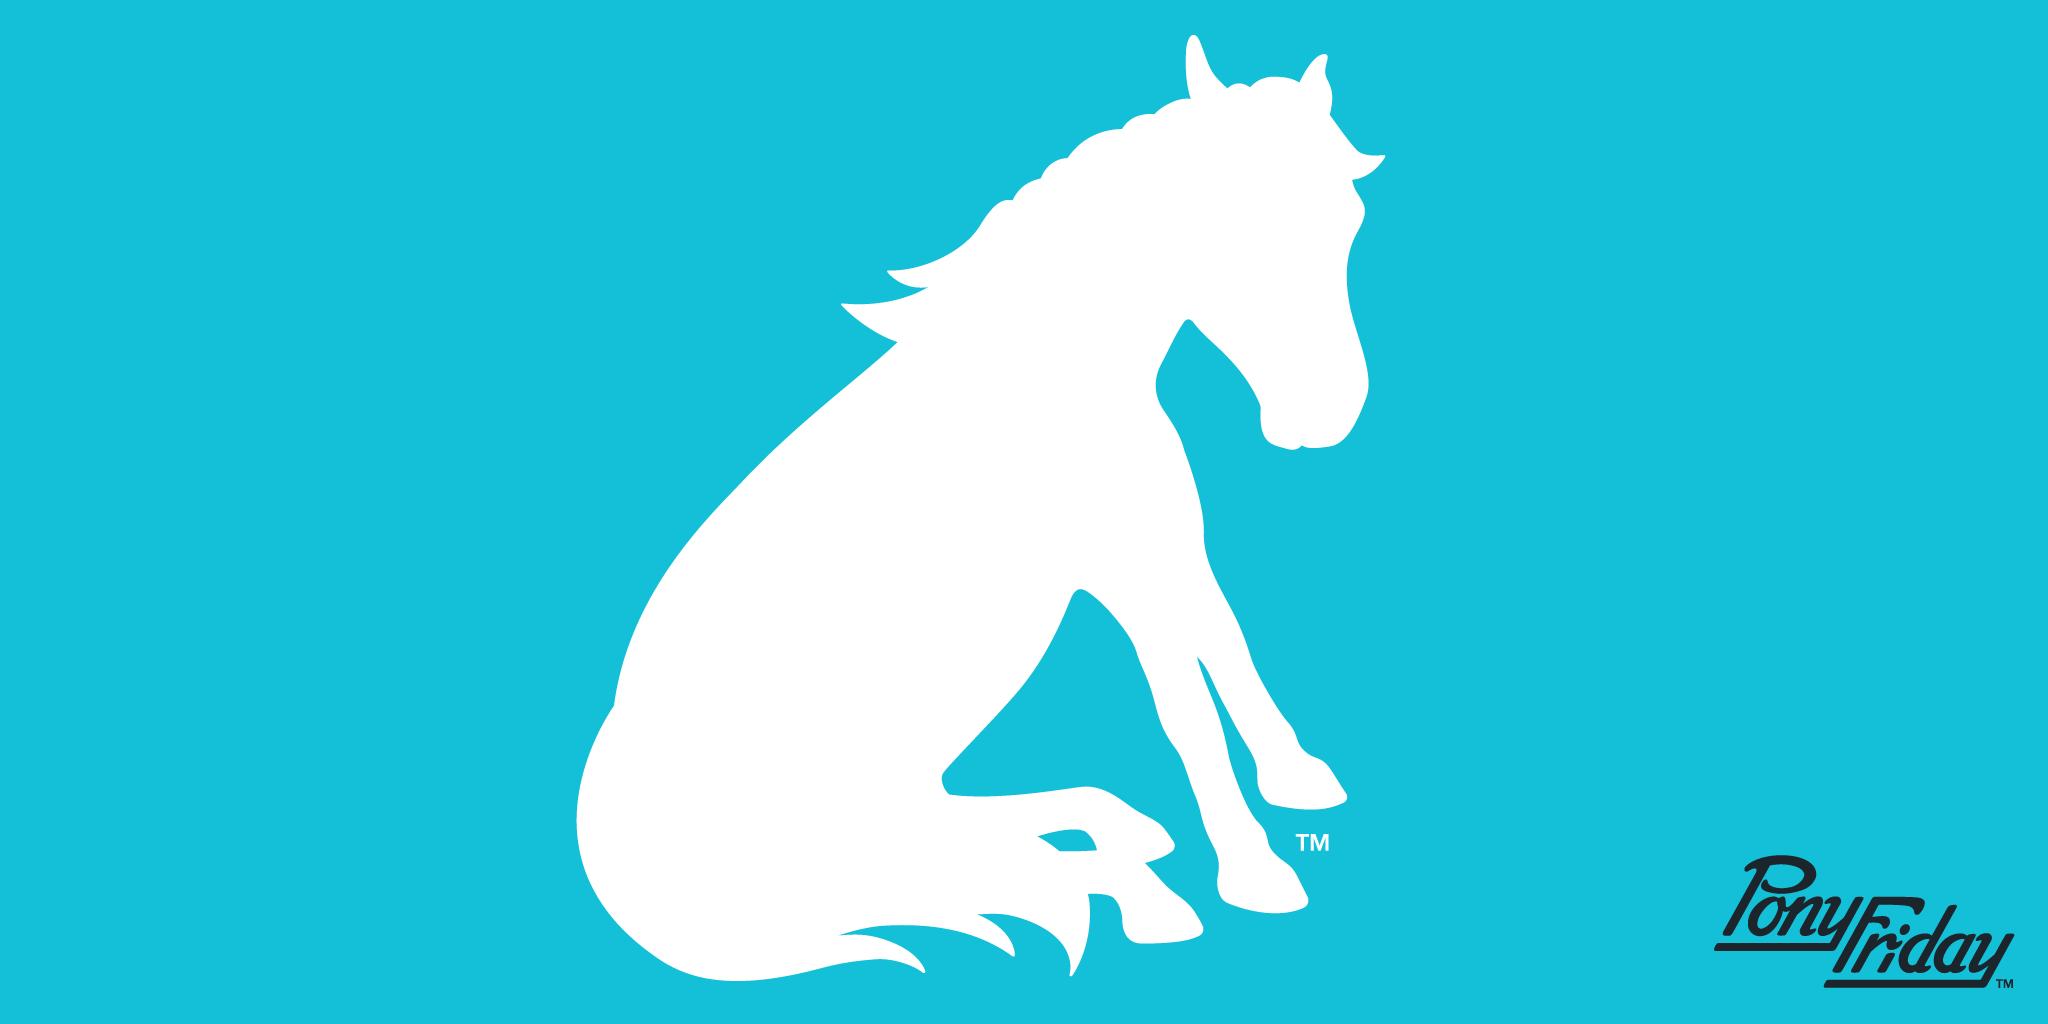 Pony-Friday-Blue-White-Horse-Logo-Brand-Icon-Studio-Blog-Header-Image.png